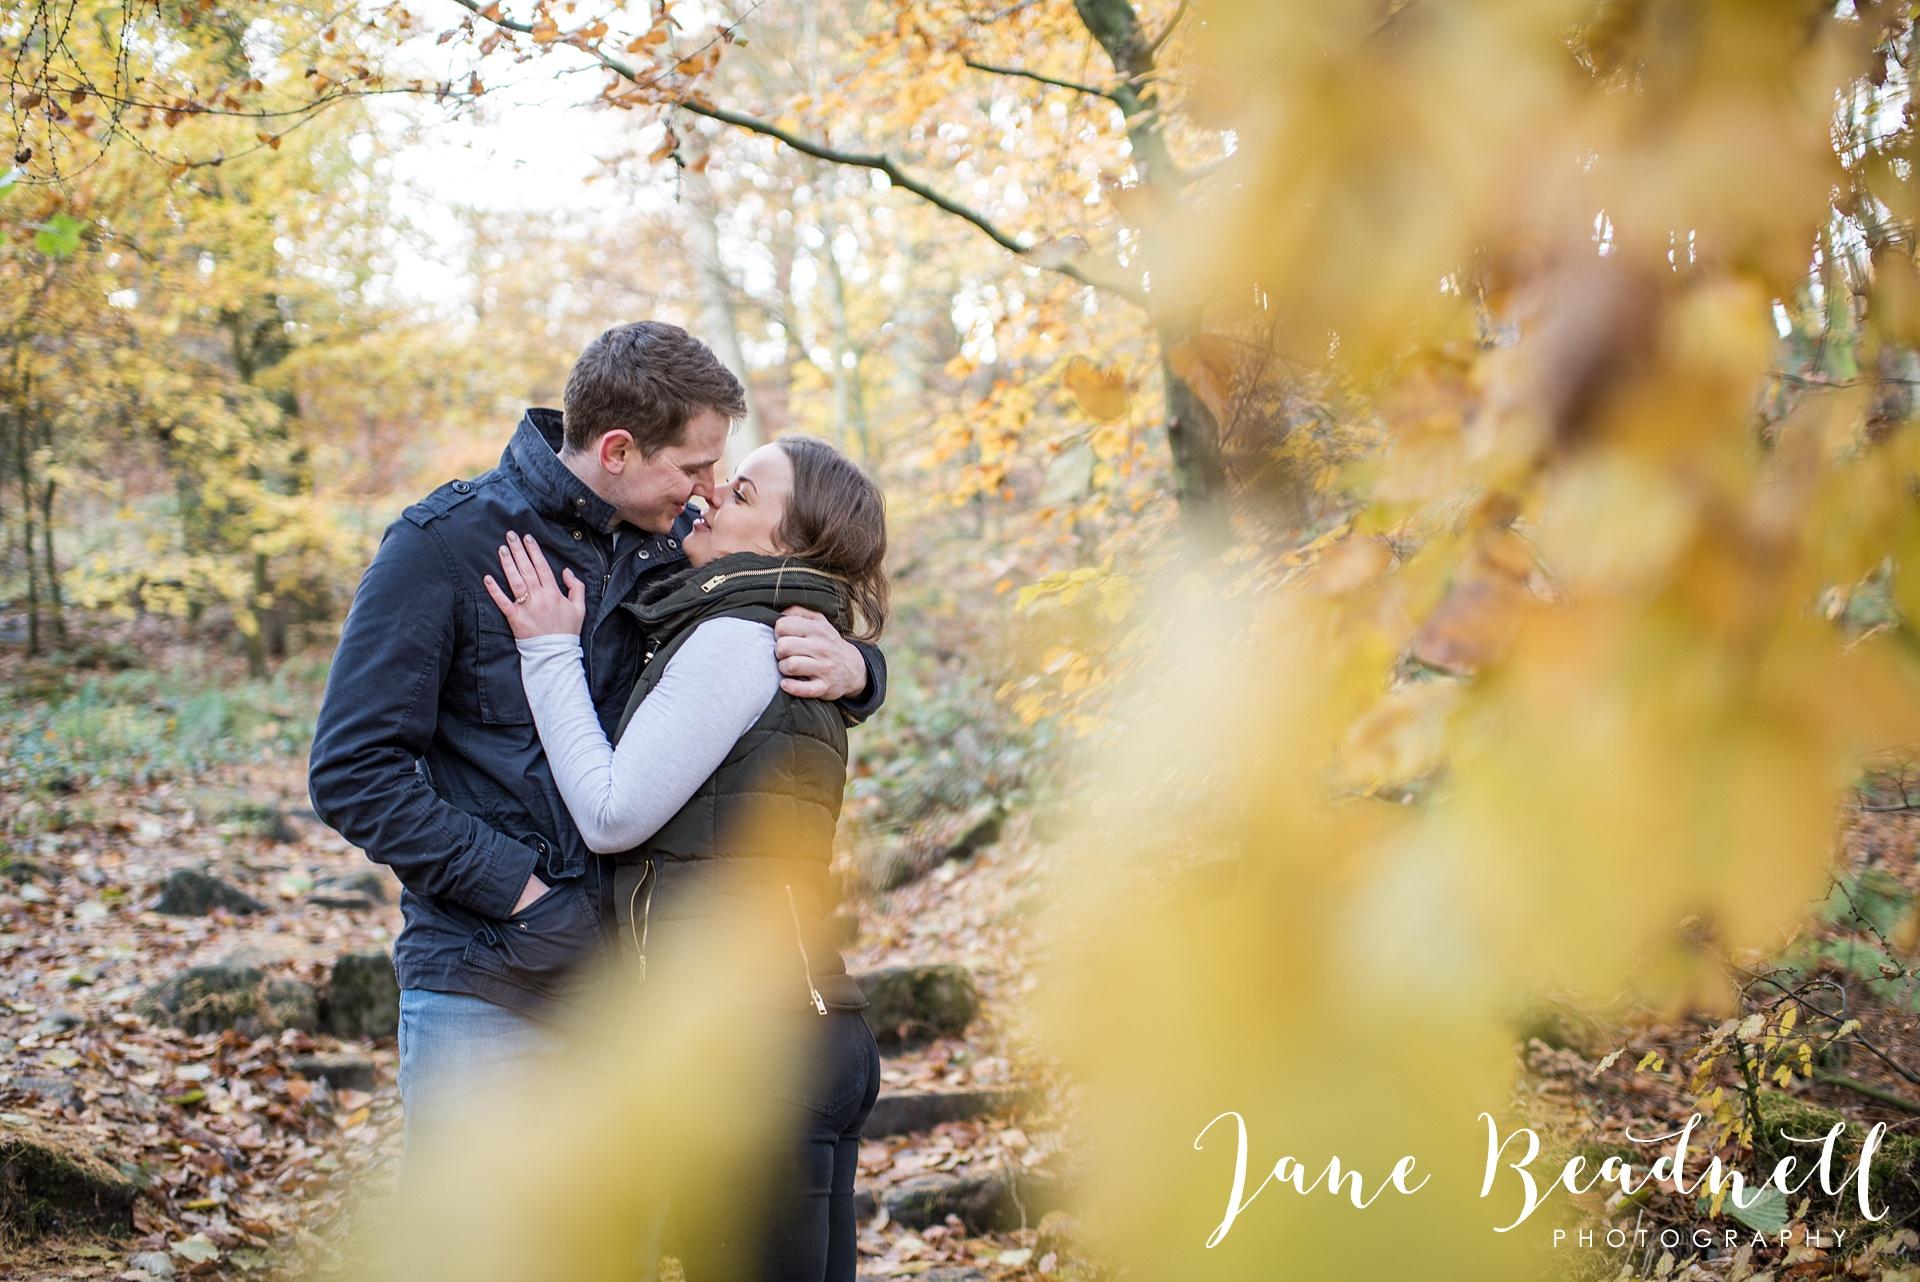 yorkshire-wedding-photographer-jane-beadnell-photography-uk-and-destination-wedding-photographer-engagement-shoot_0028